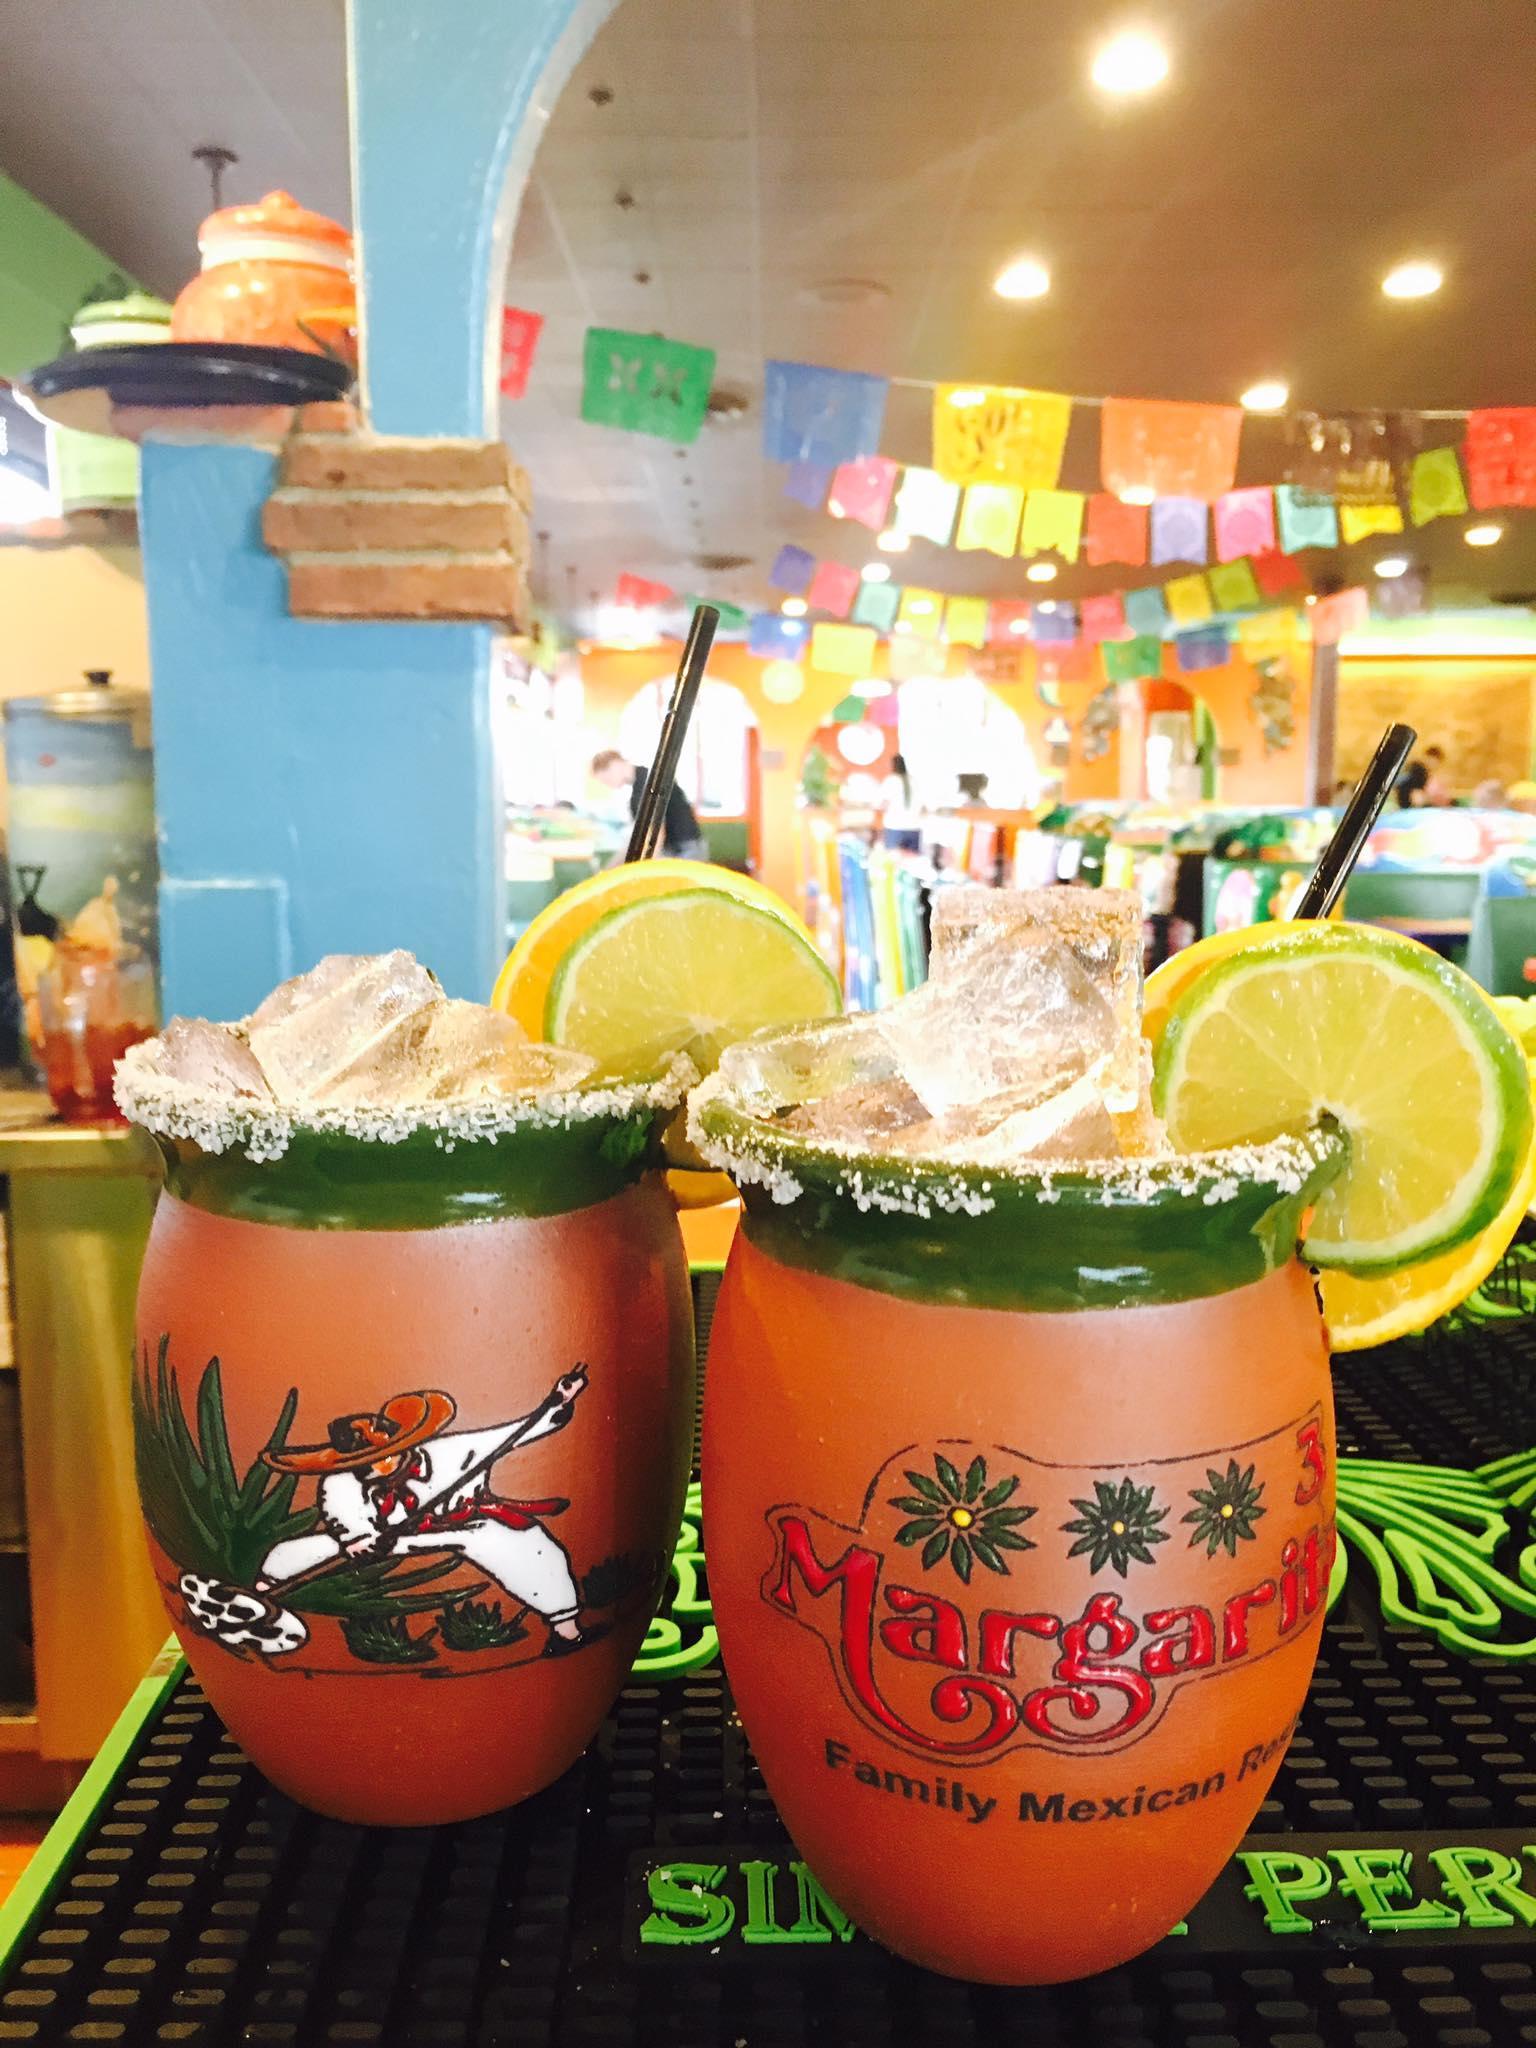 3 Margaritas Family Mexican Restaurant image 7